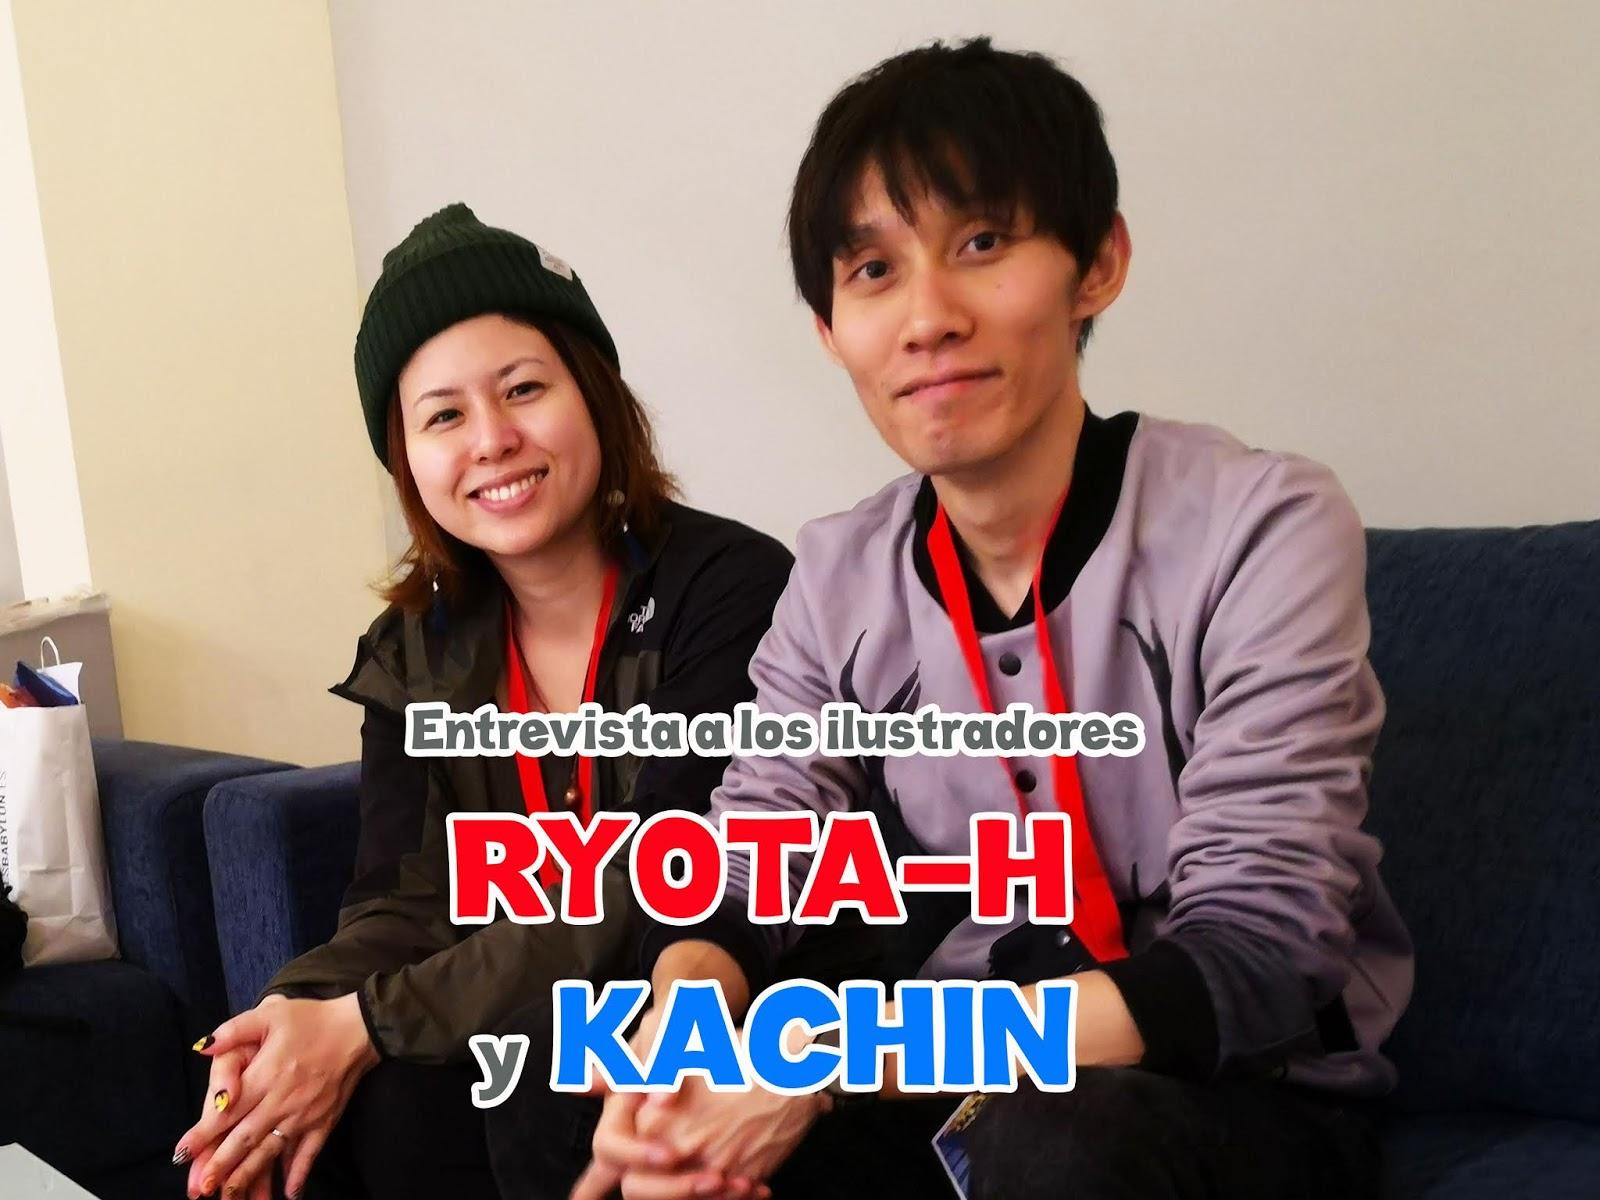 Entrevista a Kachin y Ryota-H, dibujante de La Ira de Bahamut